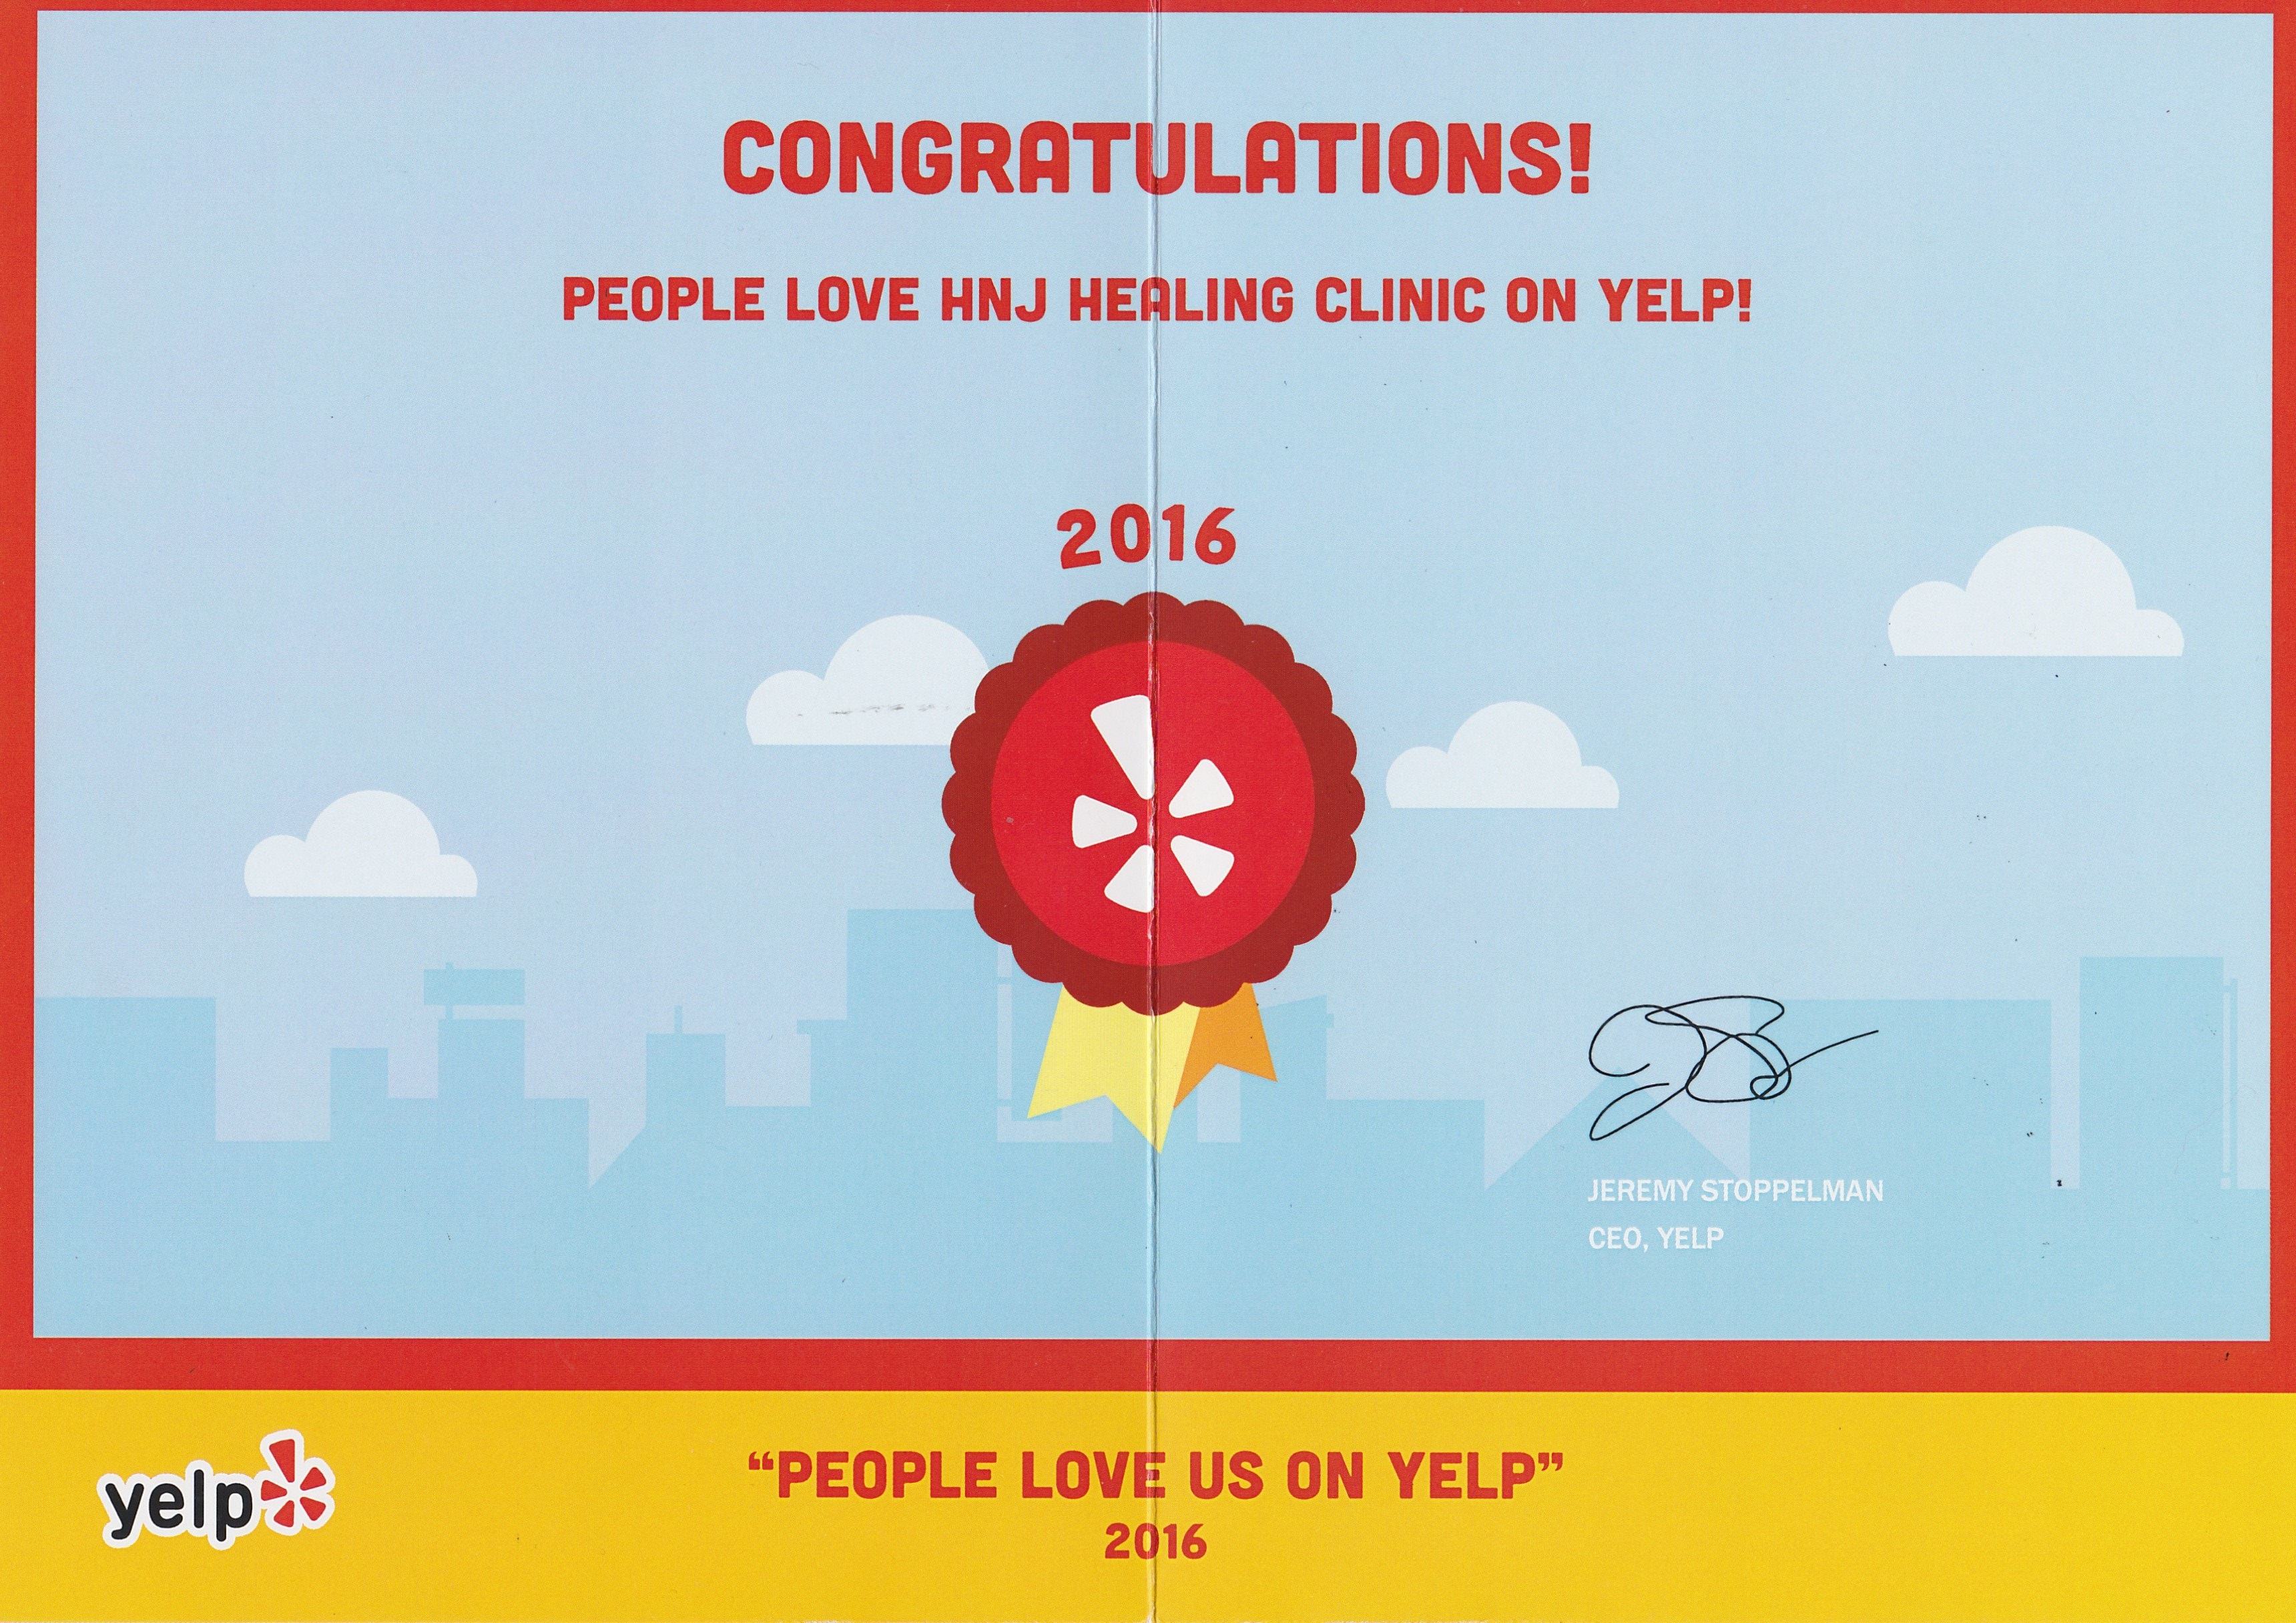 HNJ Healing Clinic image 17